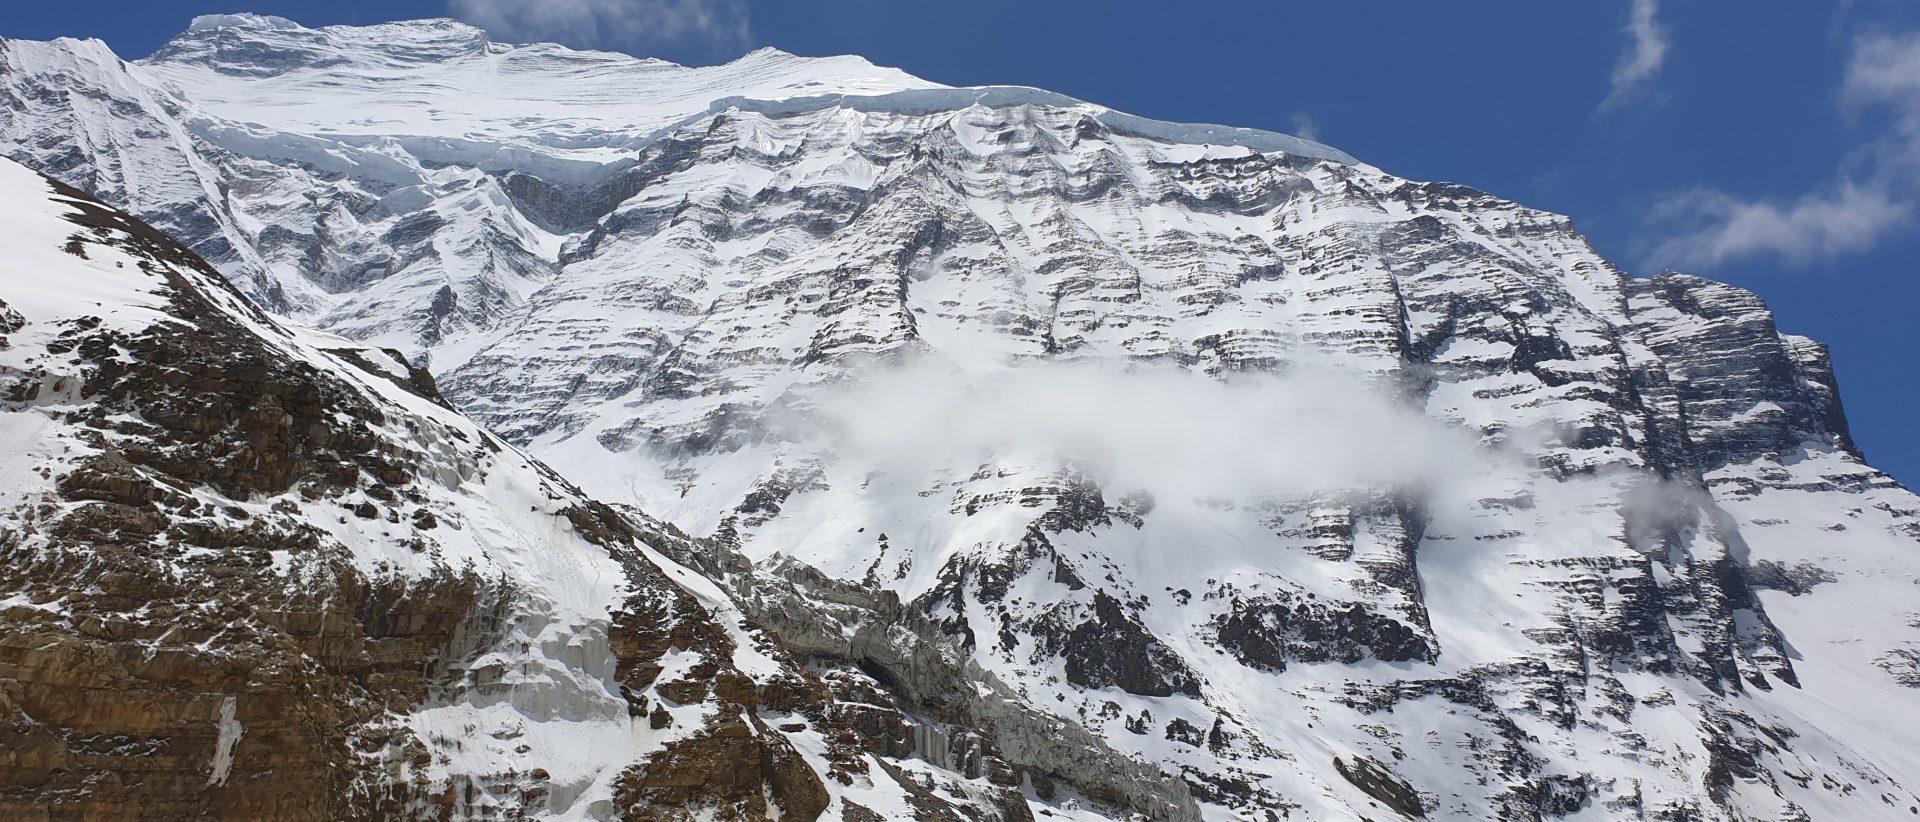 Himalayadventure MMXIX – Dhaulágirí (8 167 m) Popis / Description